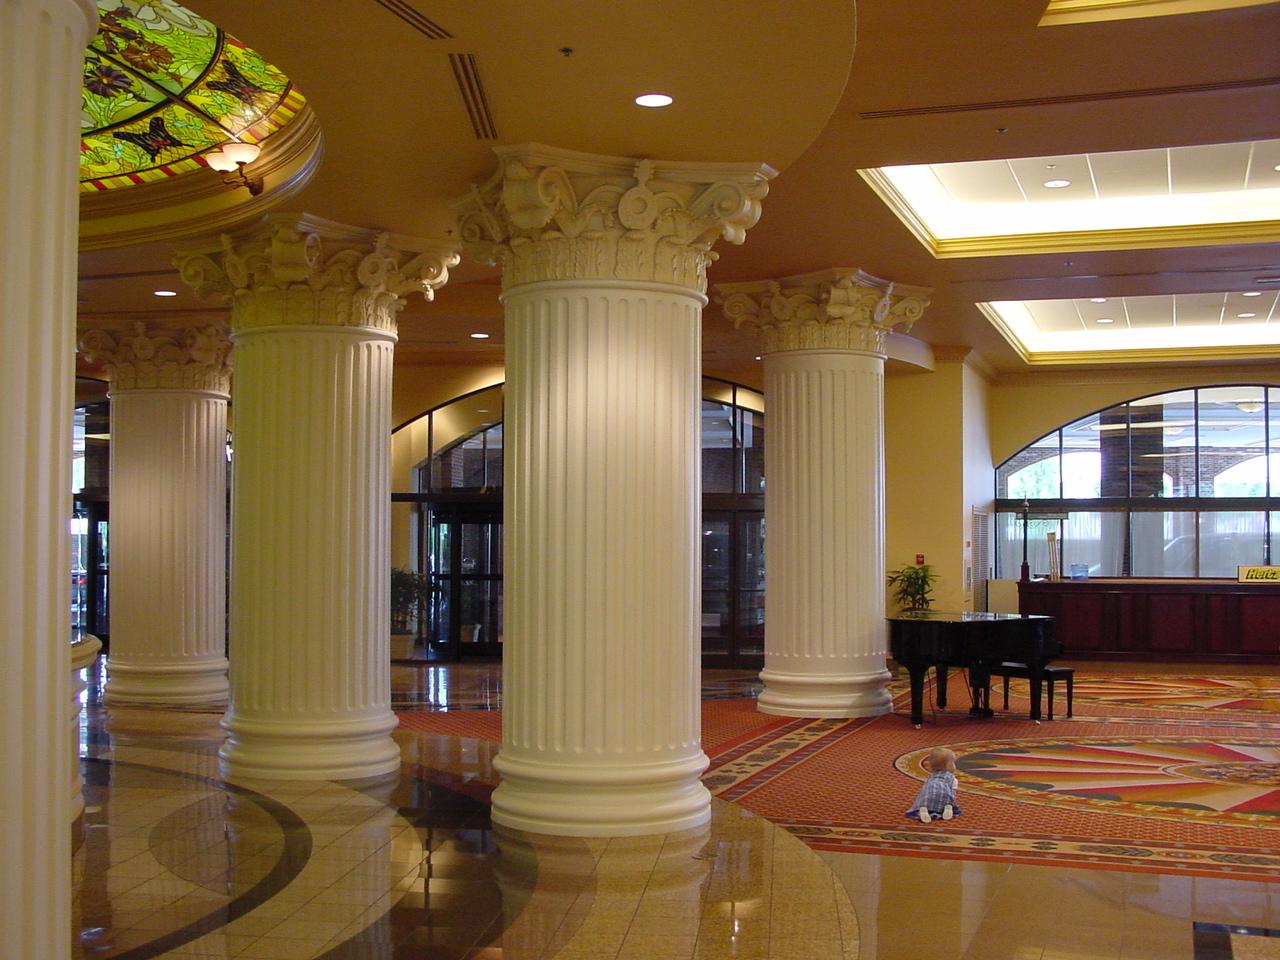 Structural Fiberglass Columns : Architectural fiberglass columns